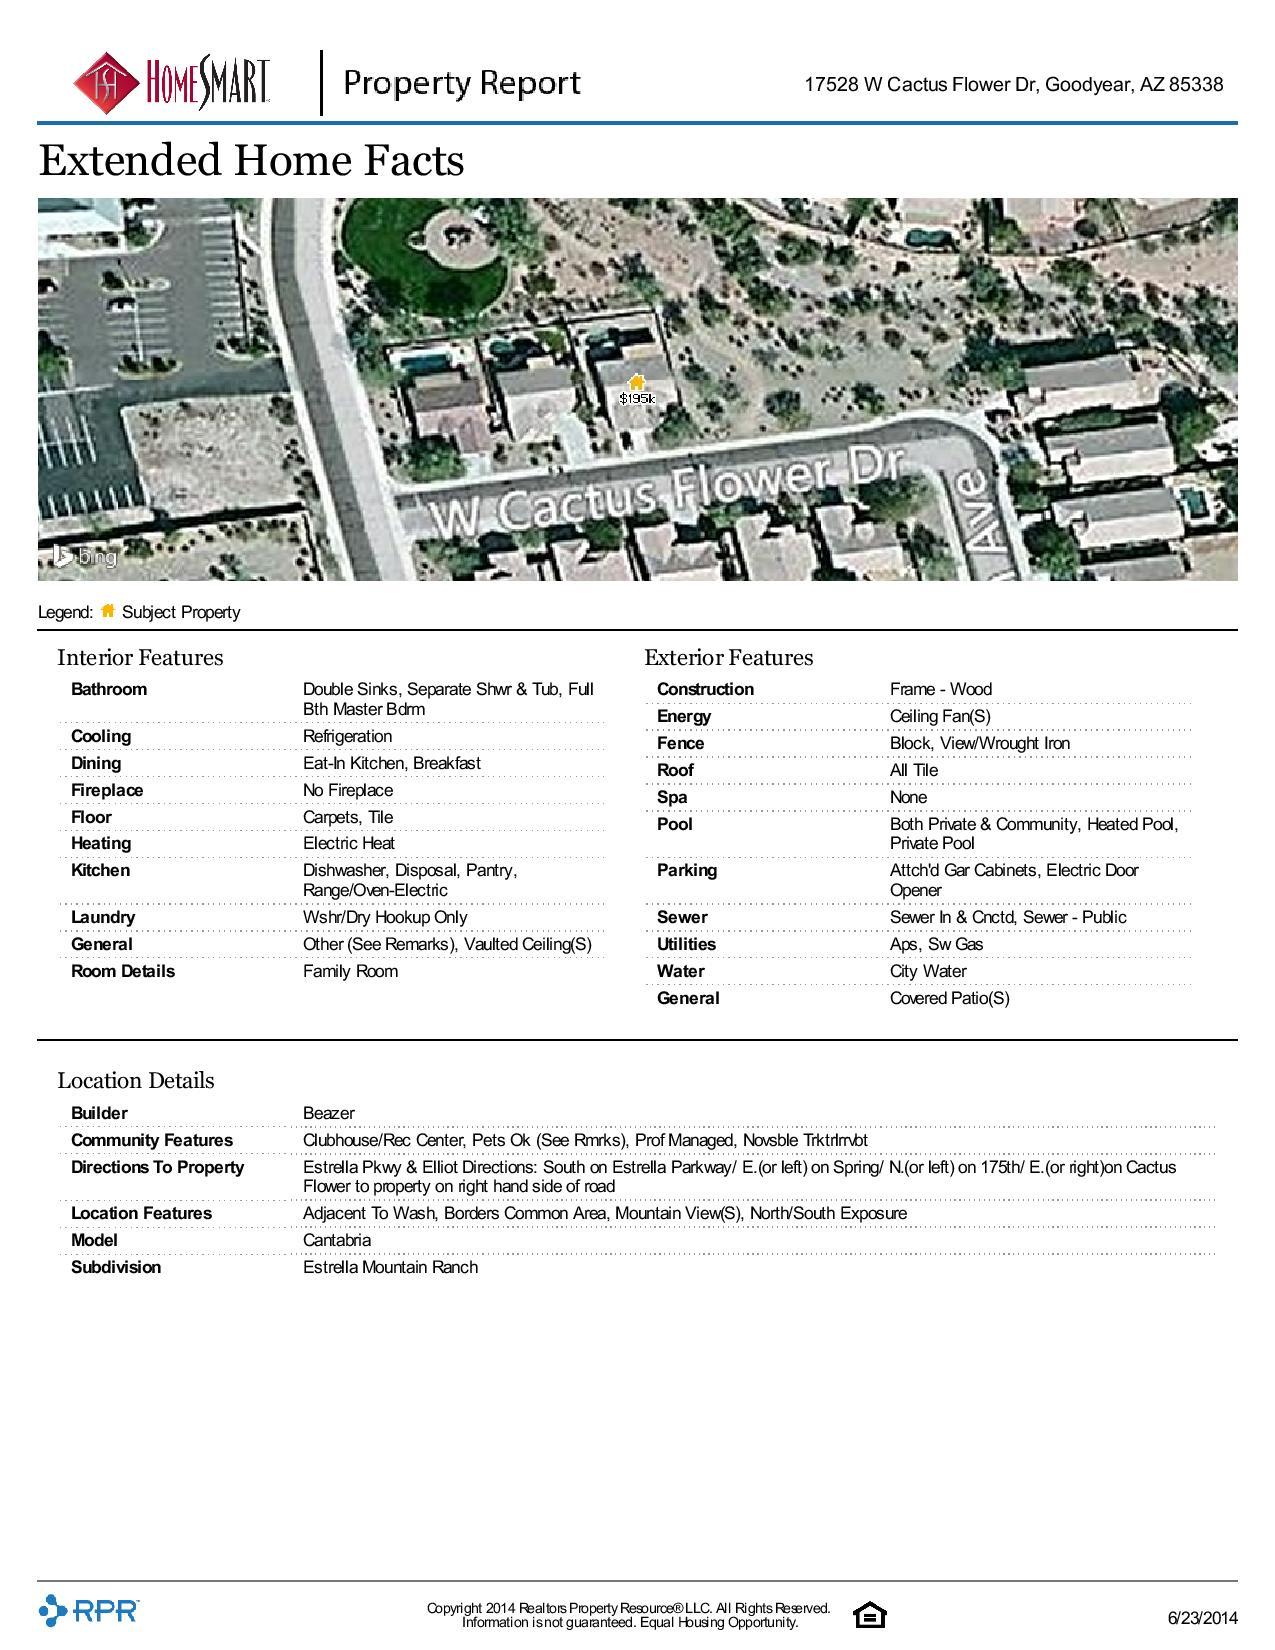 17528-W-Cactus-Flower-Dr-Goodyear-AZ-85338-page-004